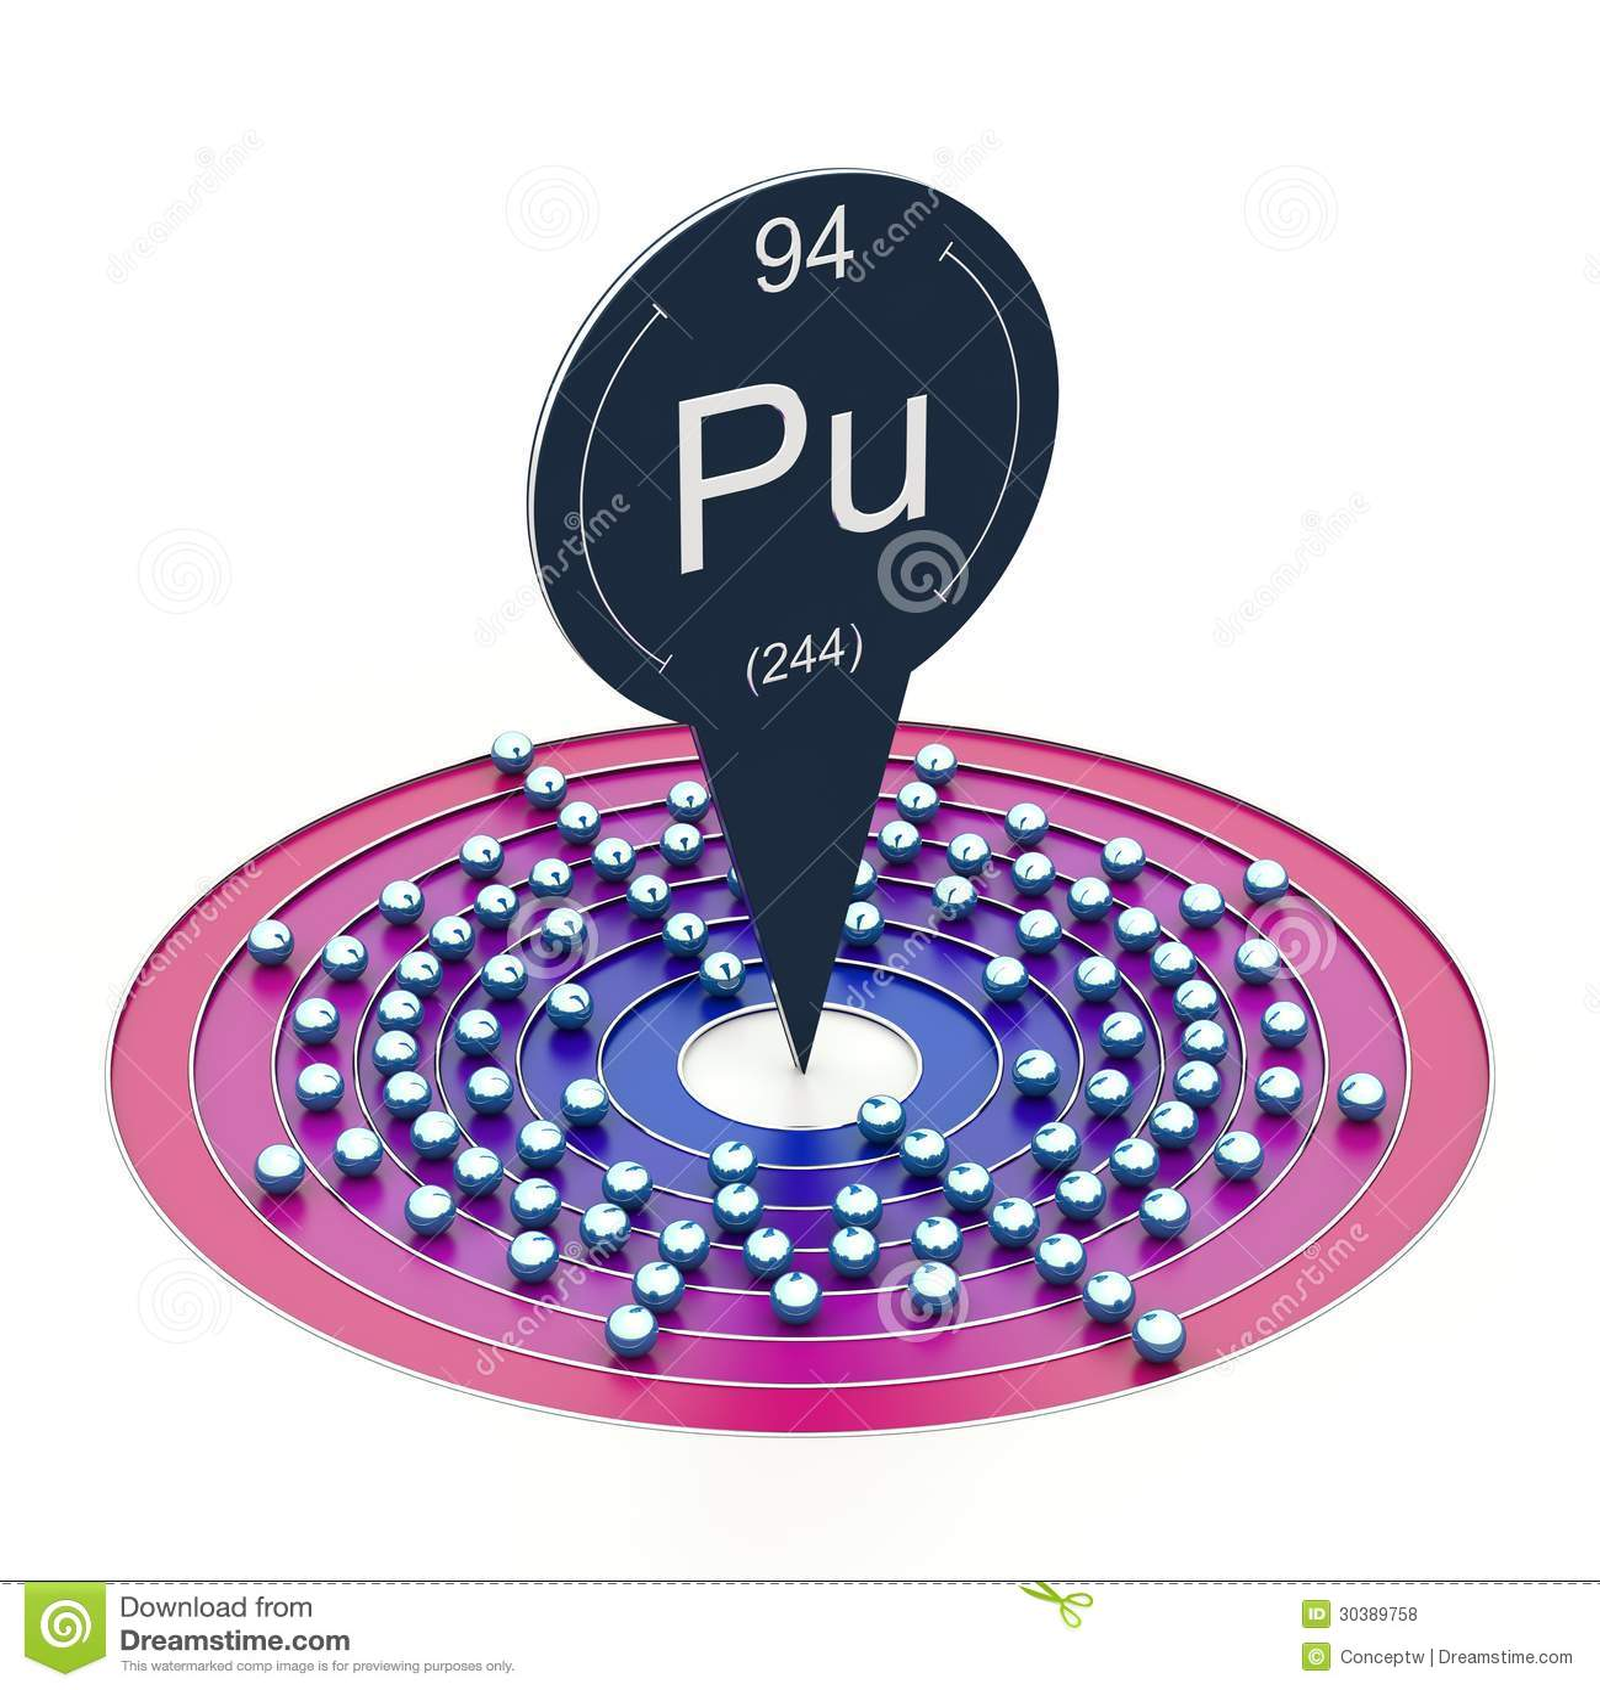 Plutonium stock illustrations 561 plutonium stock illustrations plutonium element plutonium from periodic table electron configuration royalty free stock photos biocorpaavc Image collections